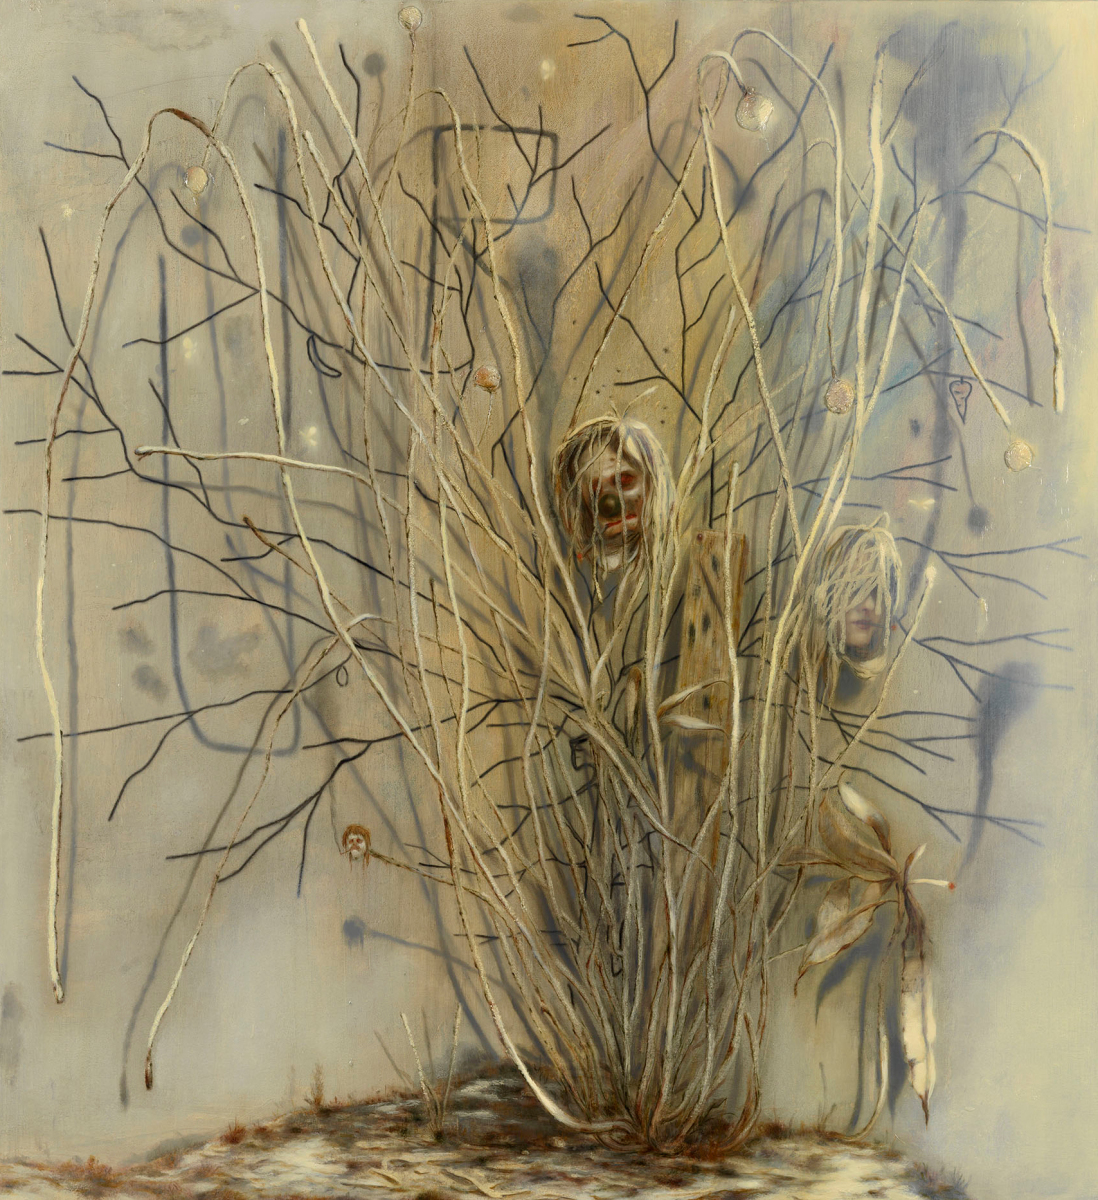 Dumb Plant with Rainbow and Splint – Nigel Cooke